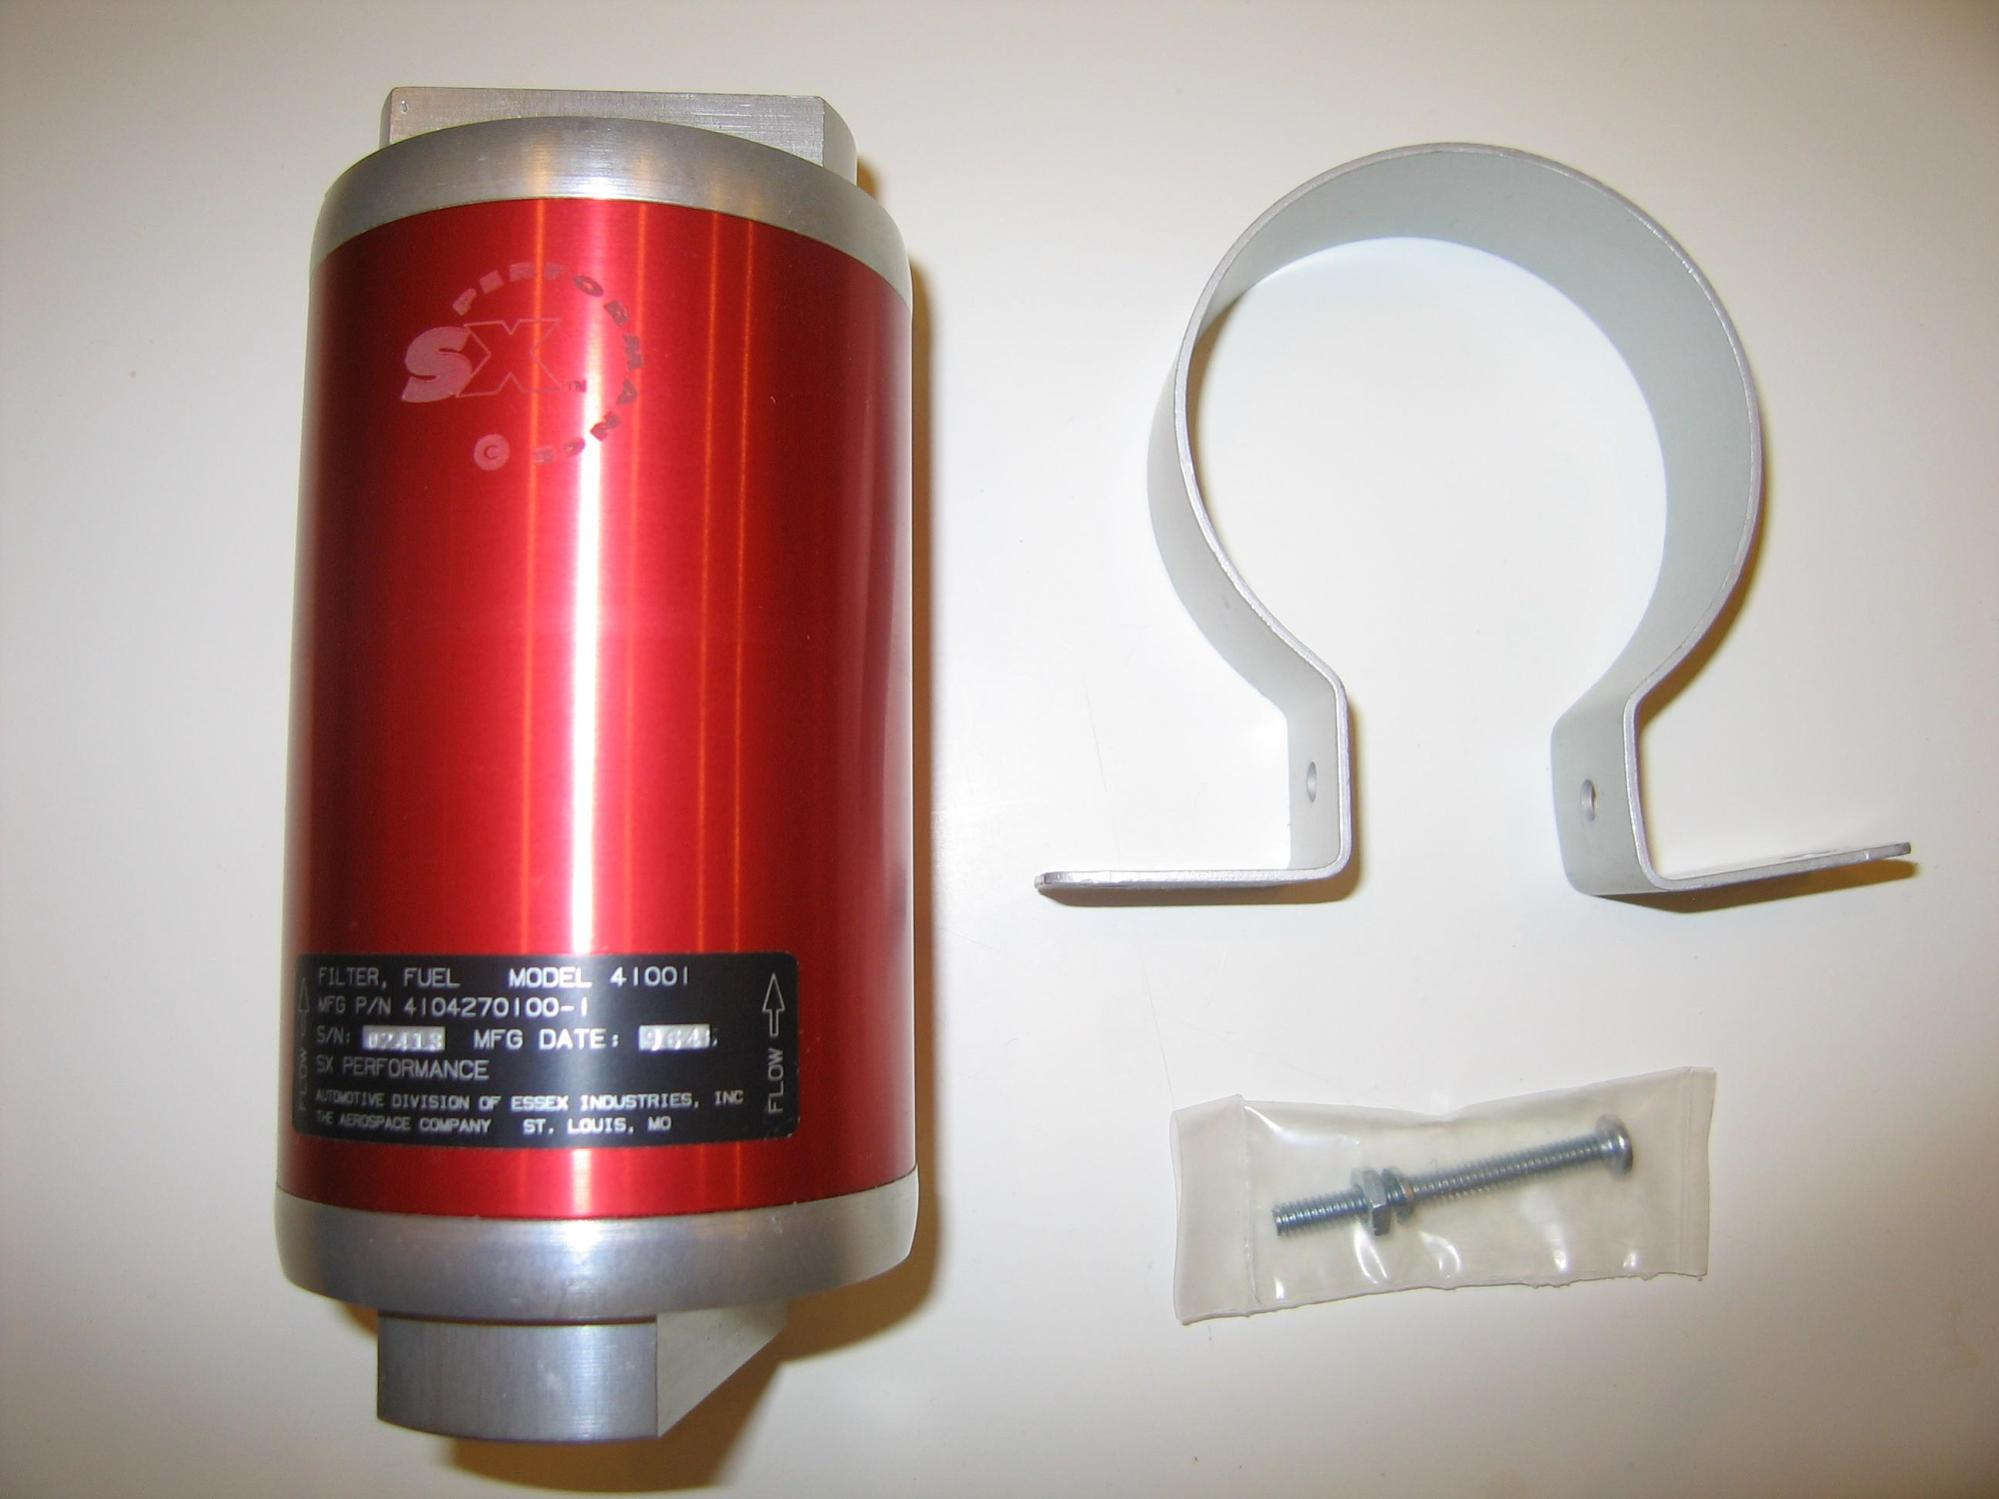 hight resolution of  sx performance fuel pump filter regulator picture 123 jpg